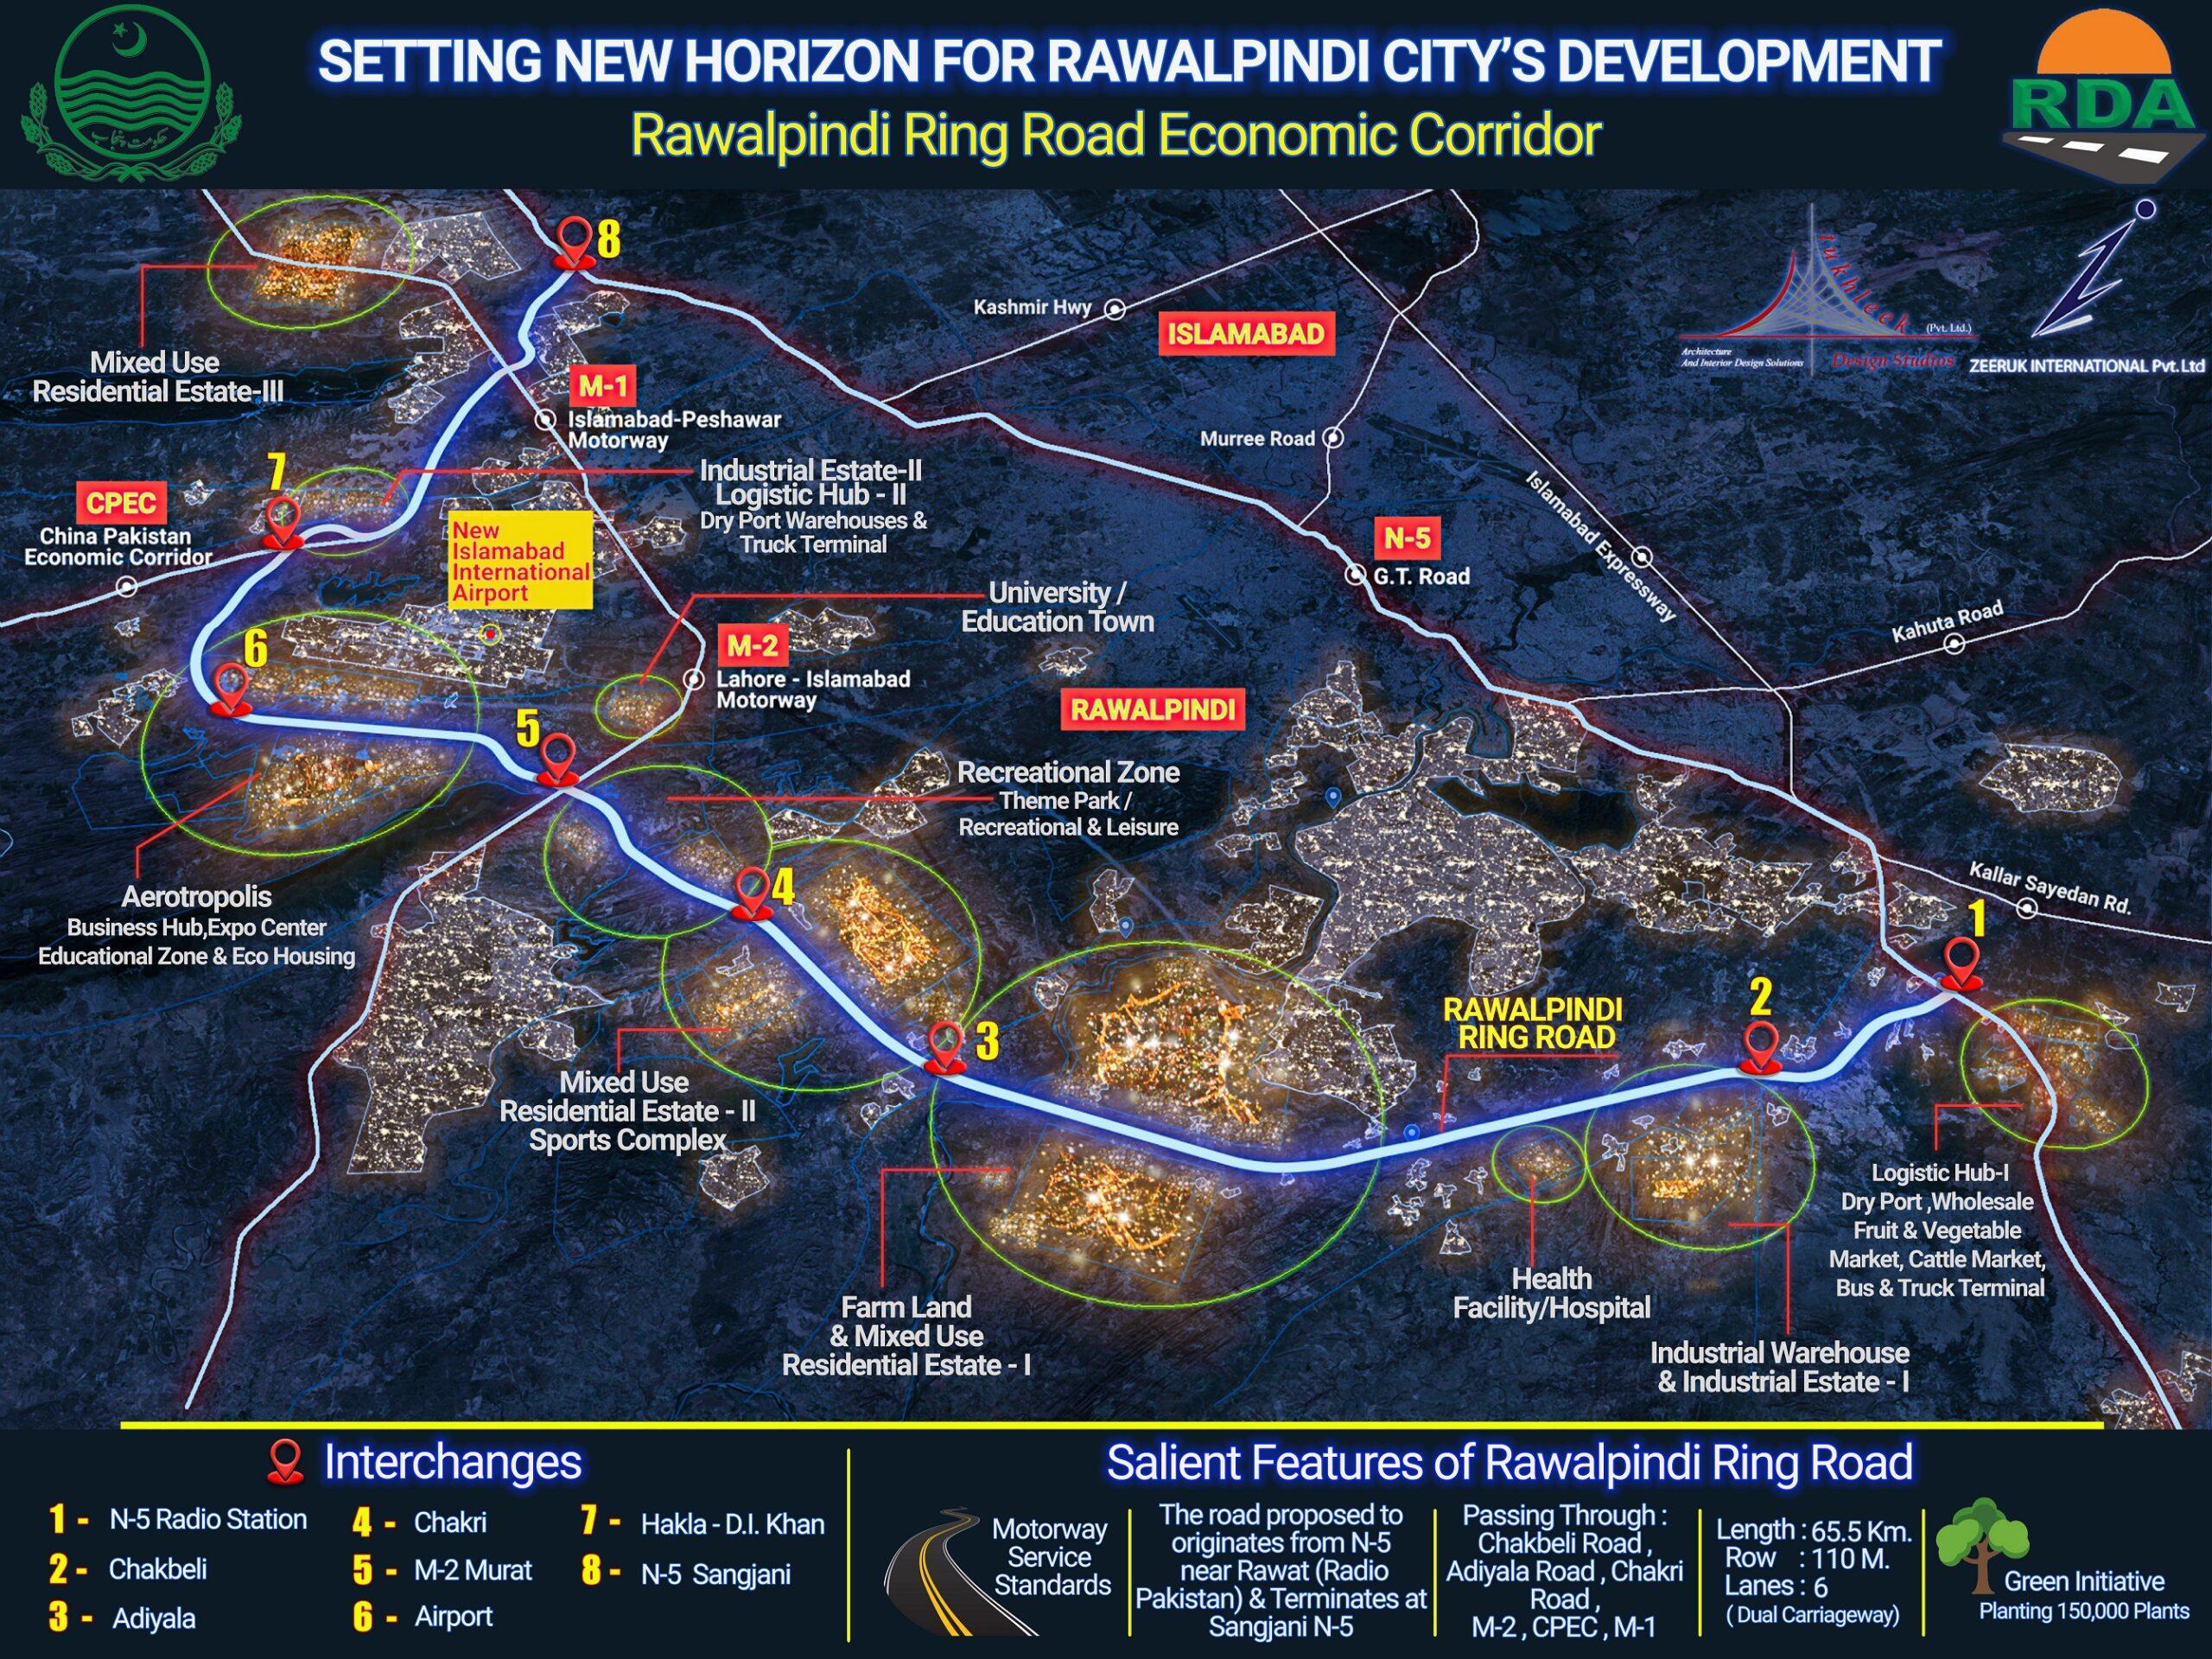 Latest status of Rawalpindi Ring Road